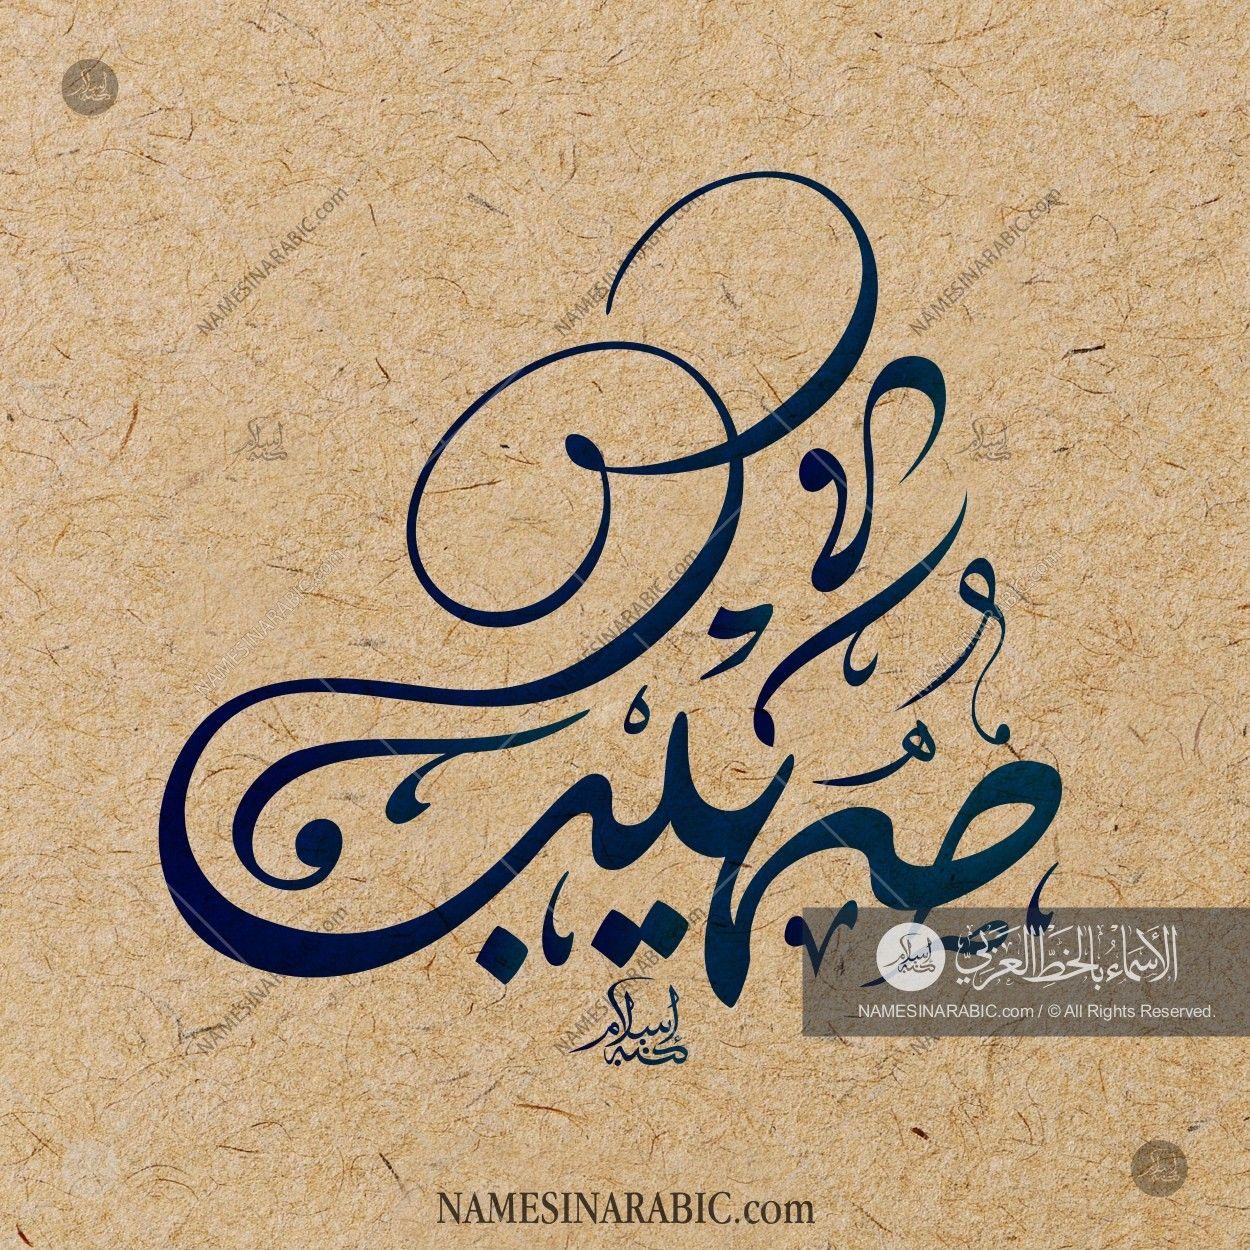 Suhaib صهيب Names In Arabic Calligraphy Name 5615 Arabic Calligraphy Art Islamic Calligraphy Calligraphy Name